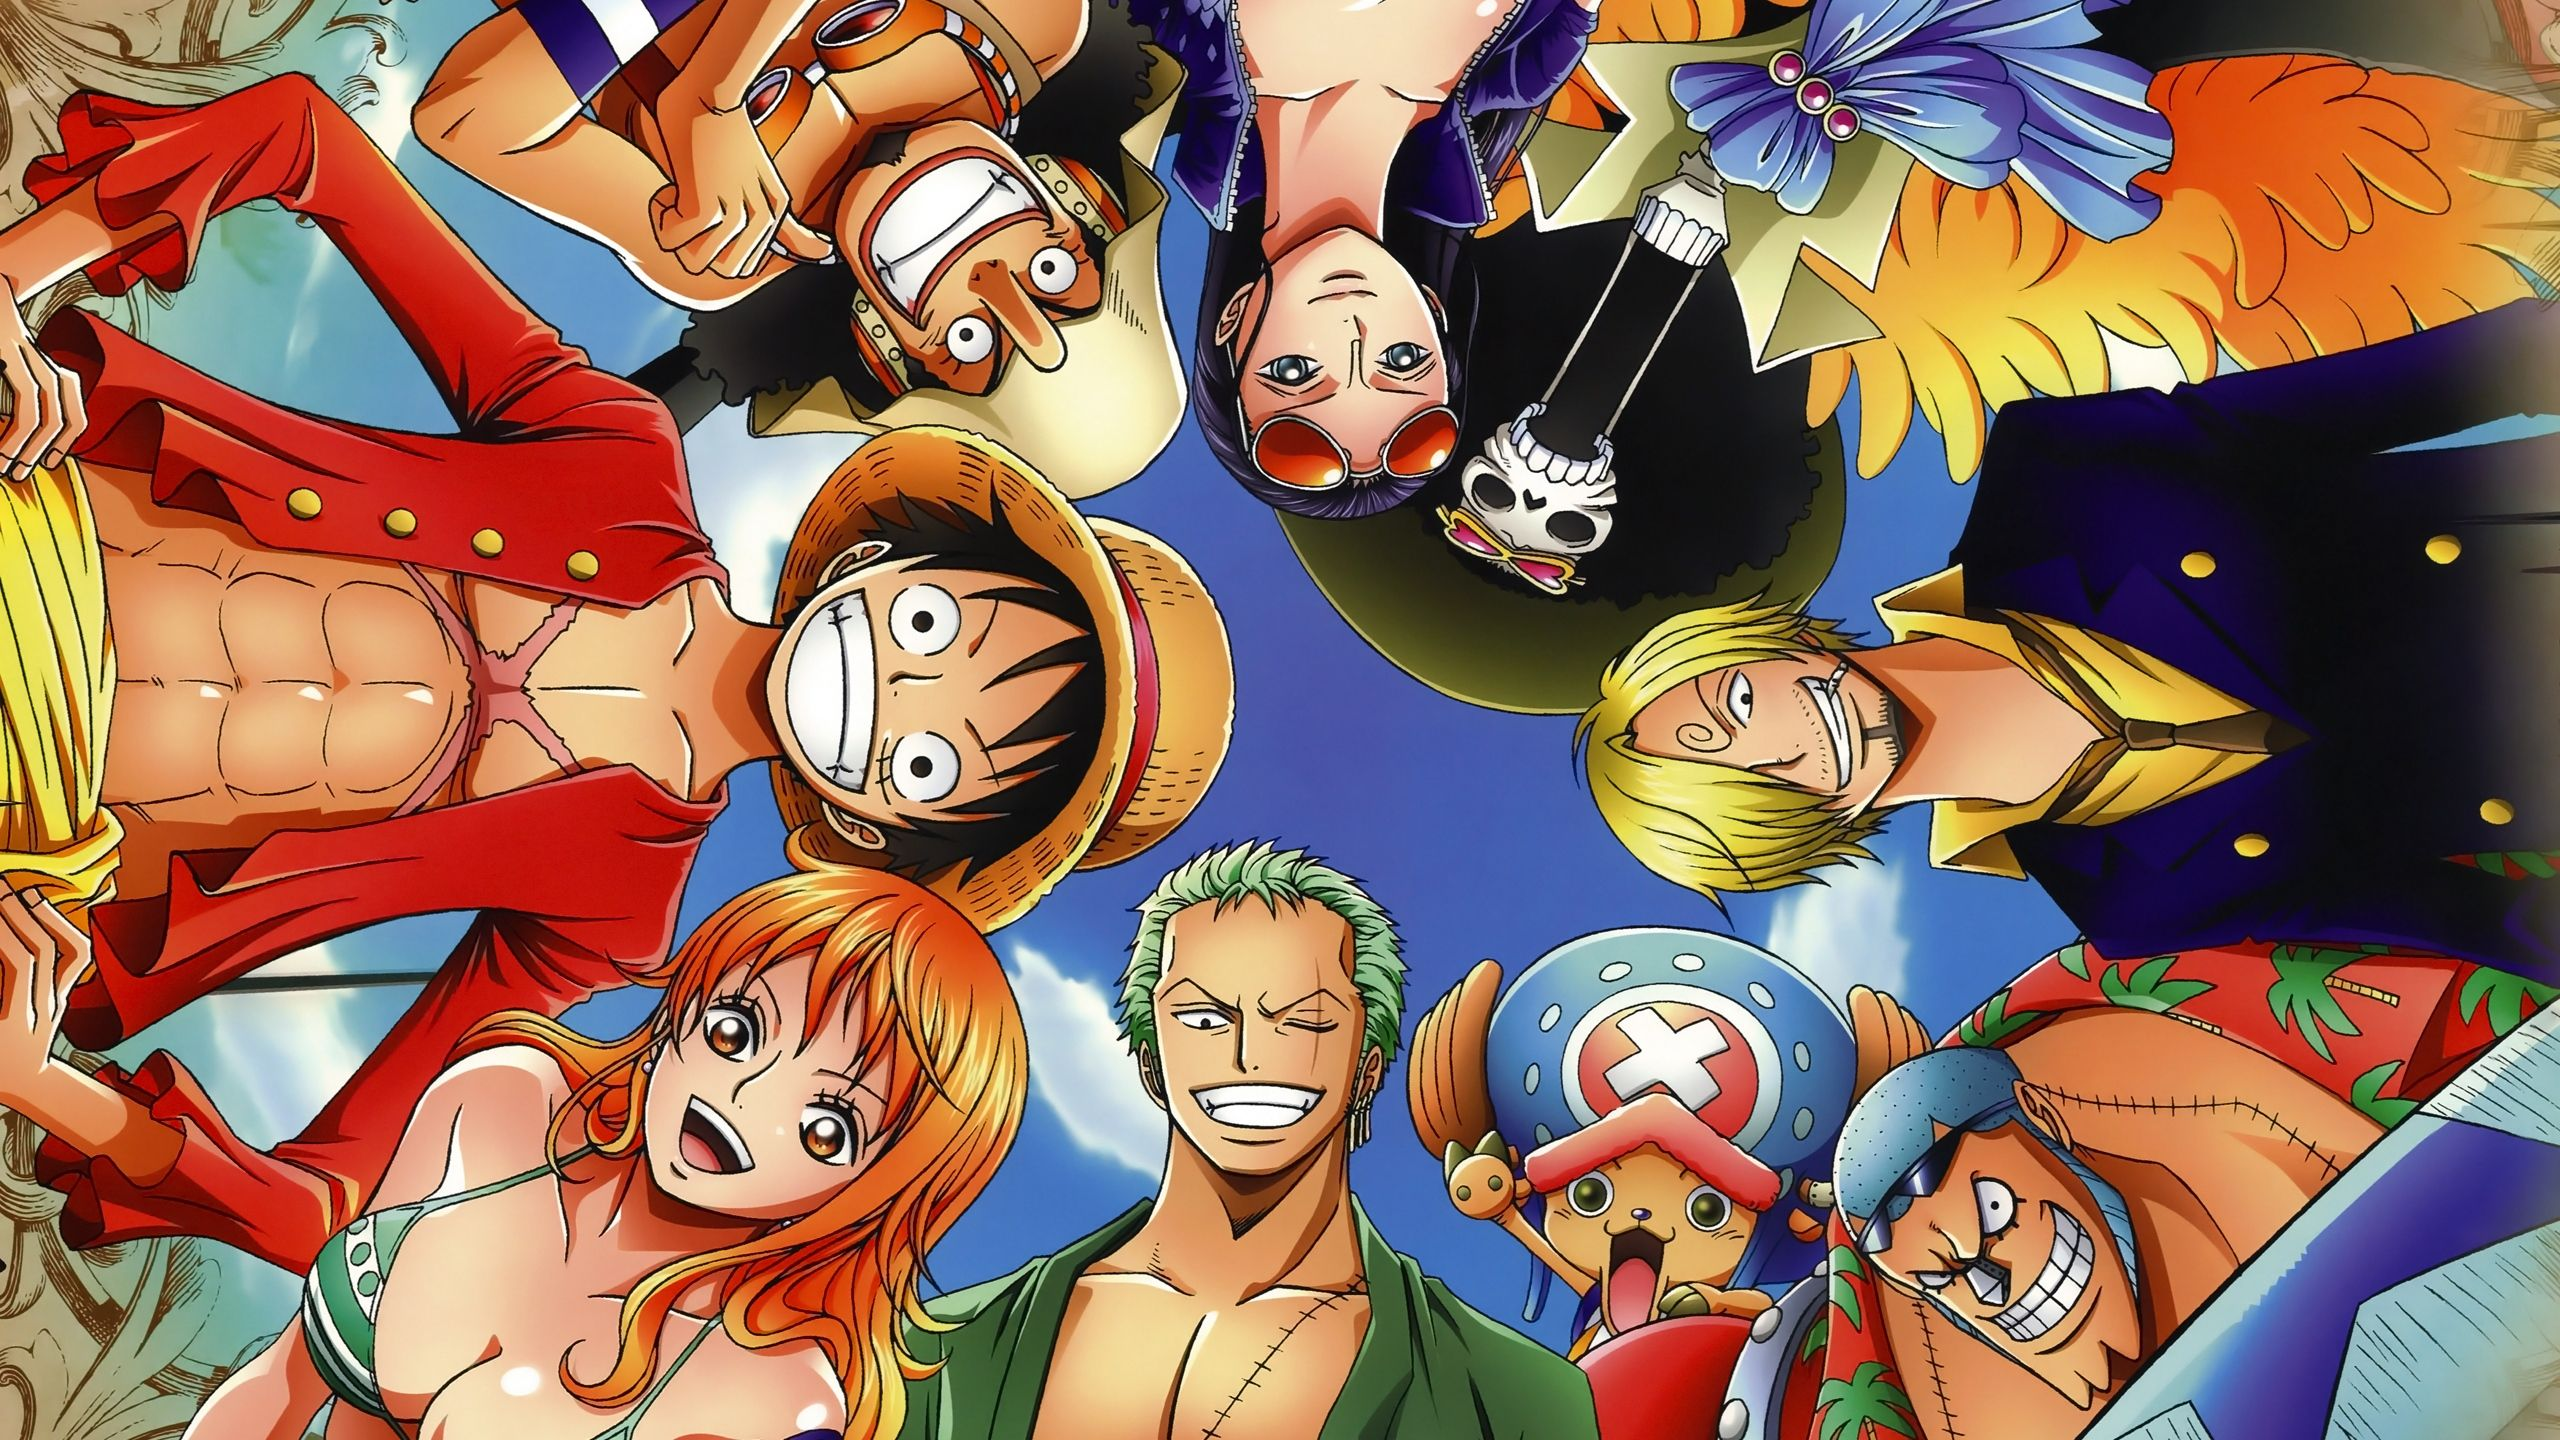 One Piece Nami Hd Wallpapers One Piece Anime One Piece New World One Piece Manga